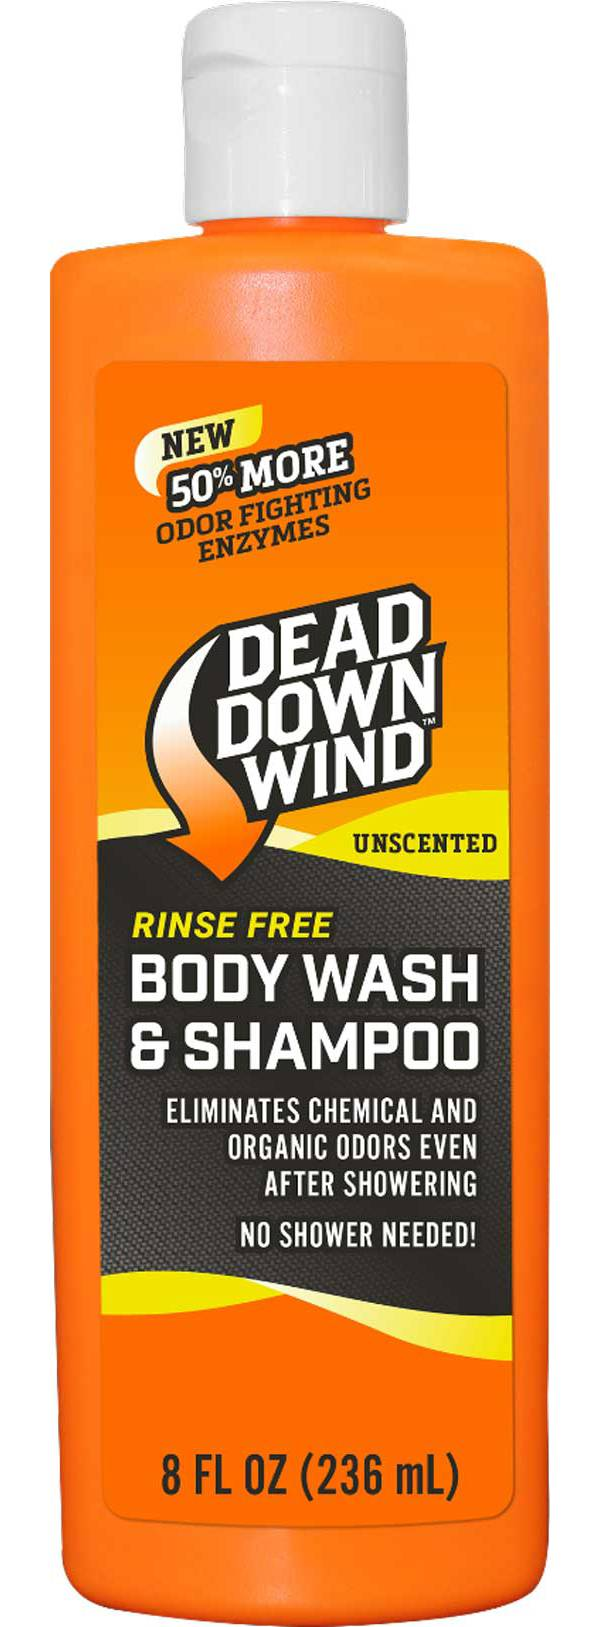 BaseCamp Rinse Free Body Wash and Shampoo product image